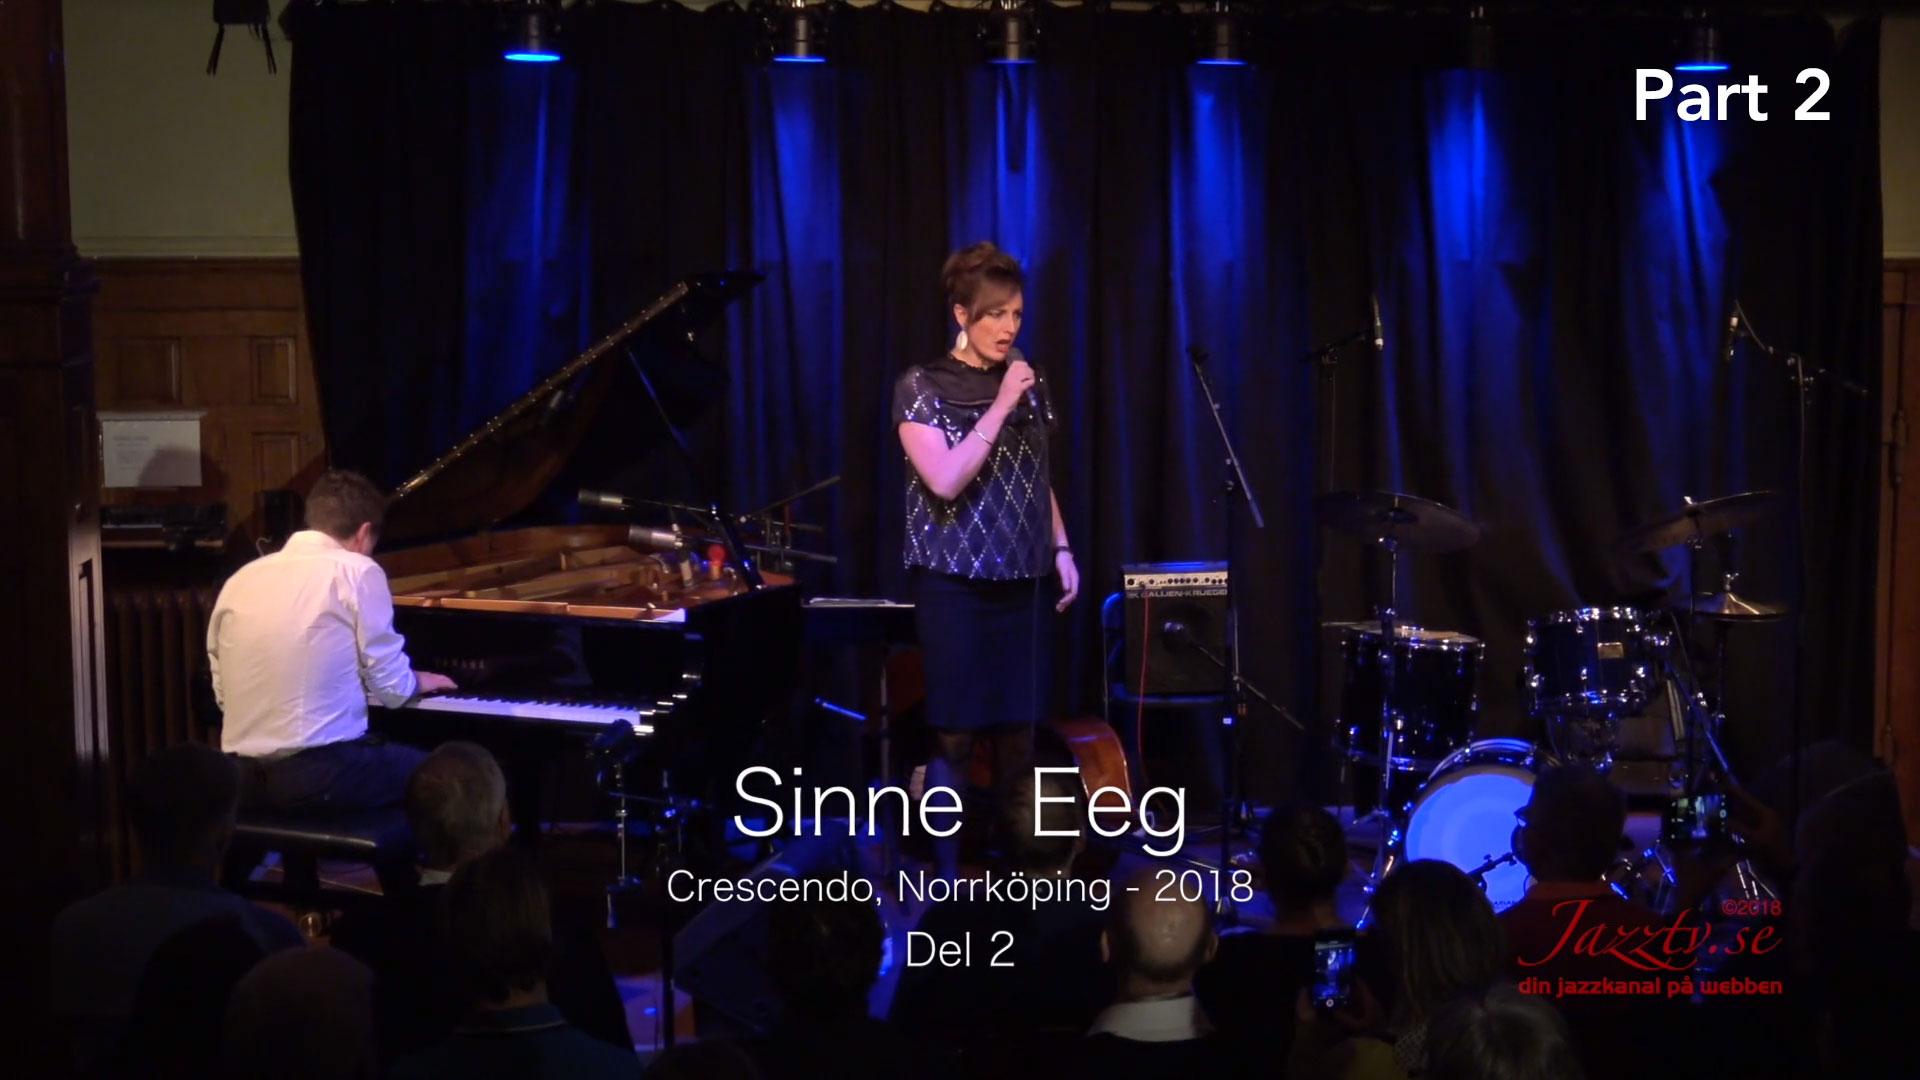 Sinne Eeg Crescendo 2018